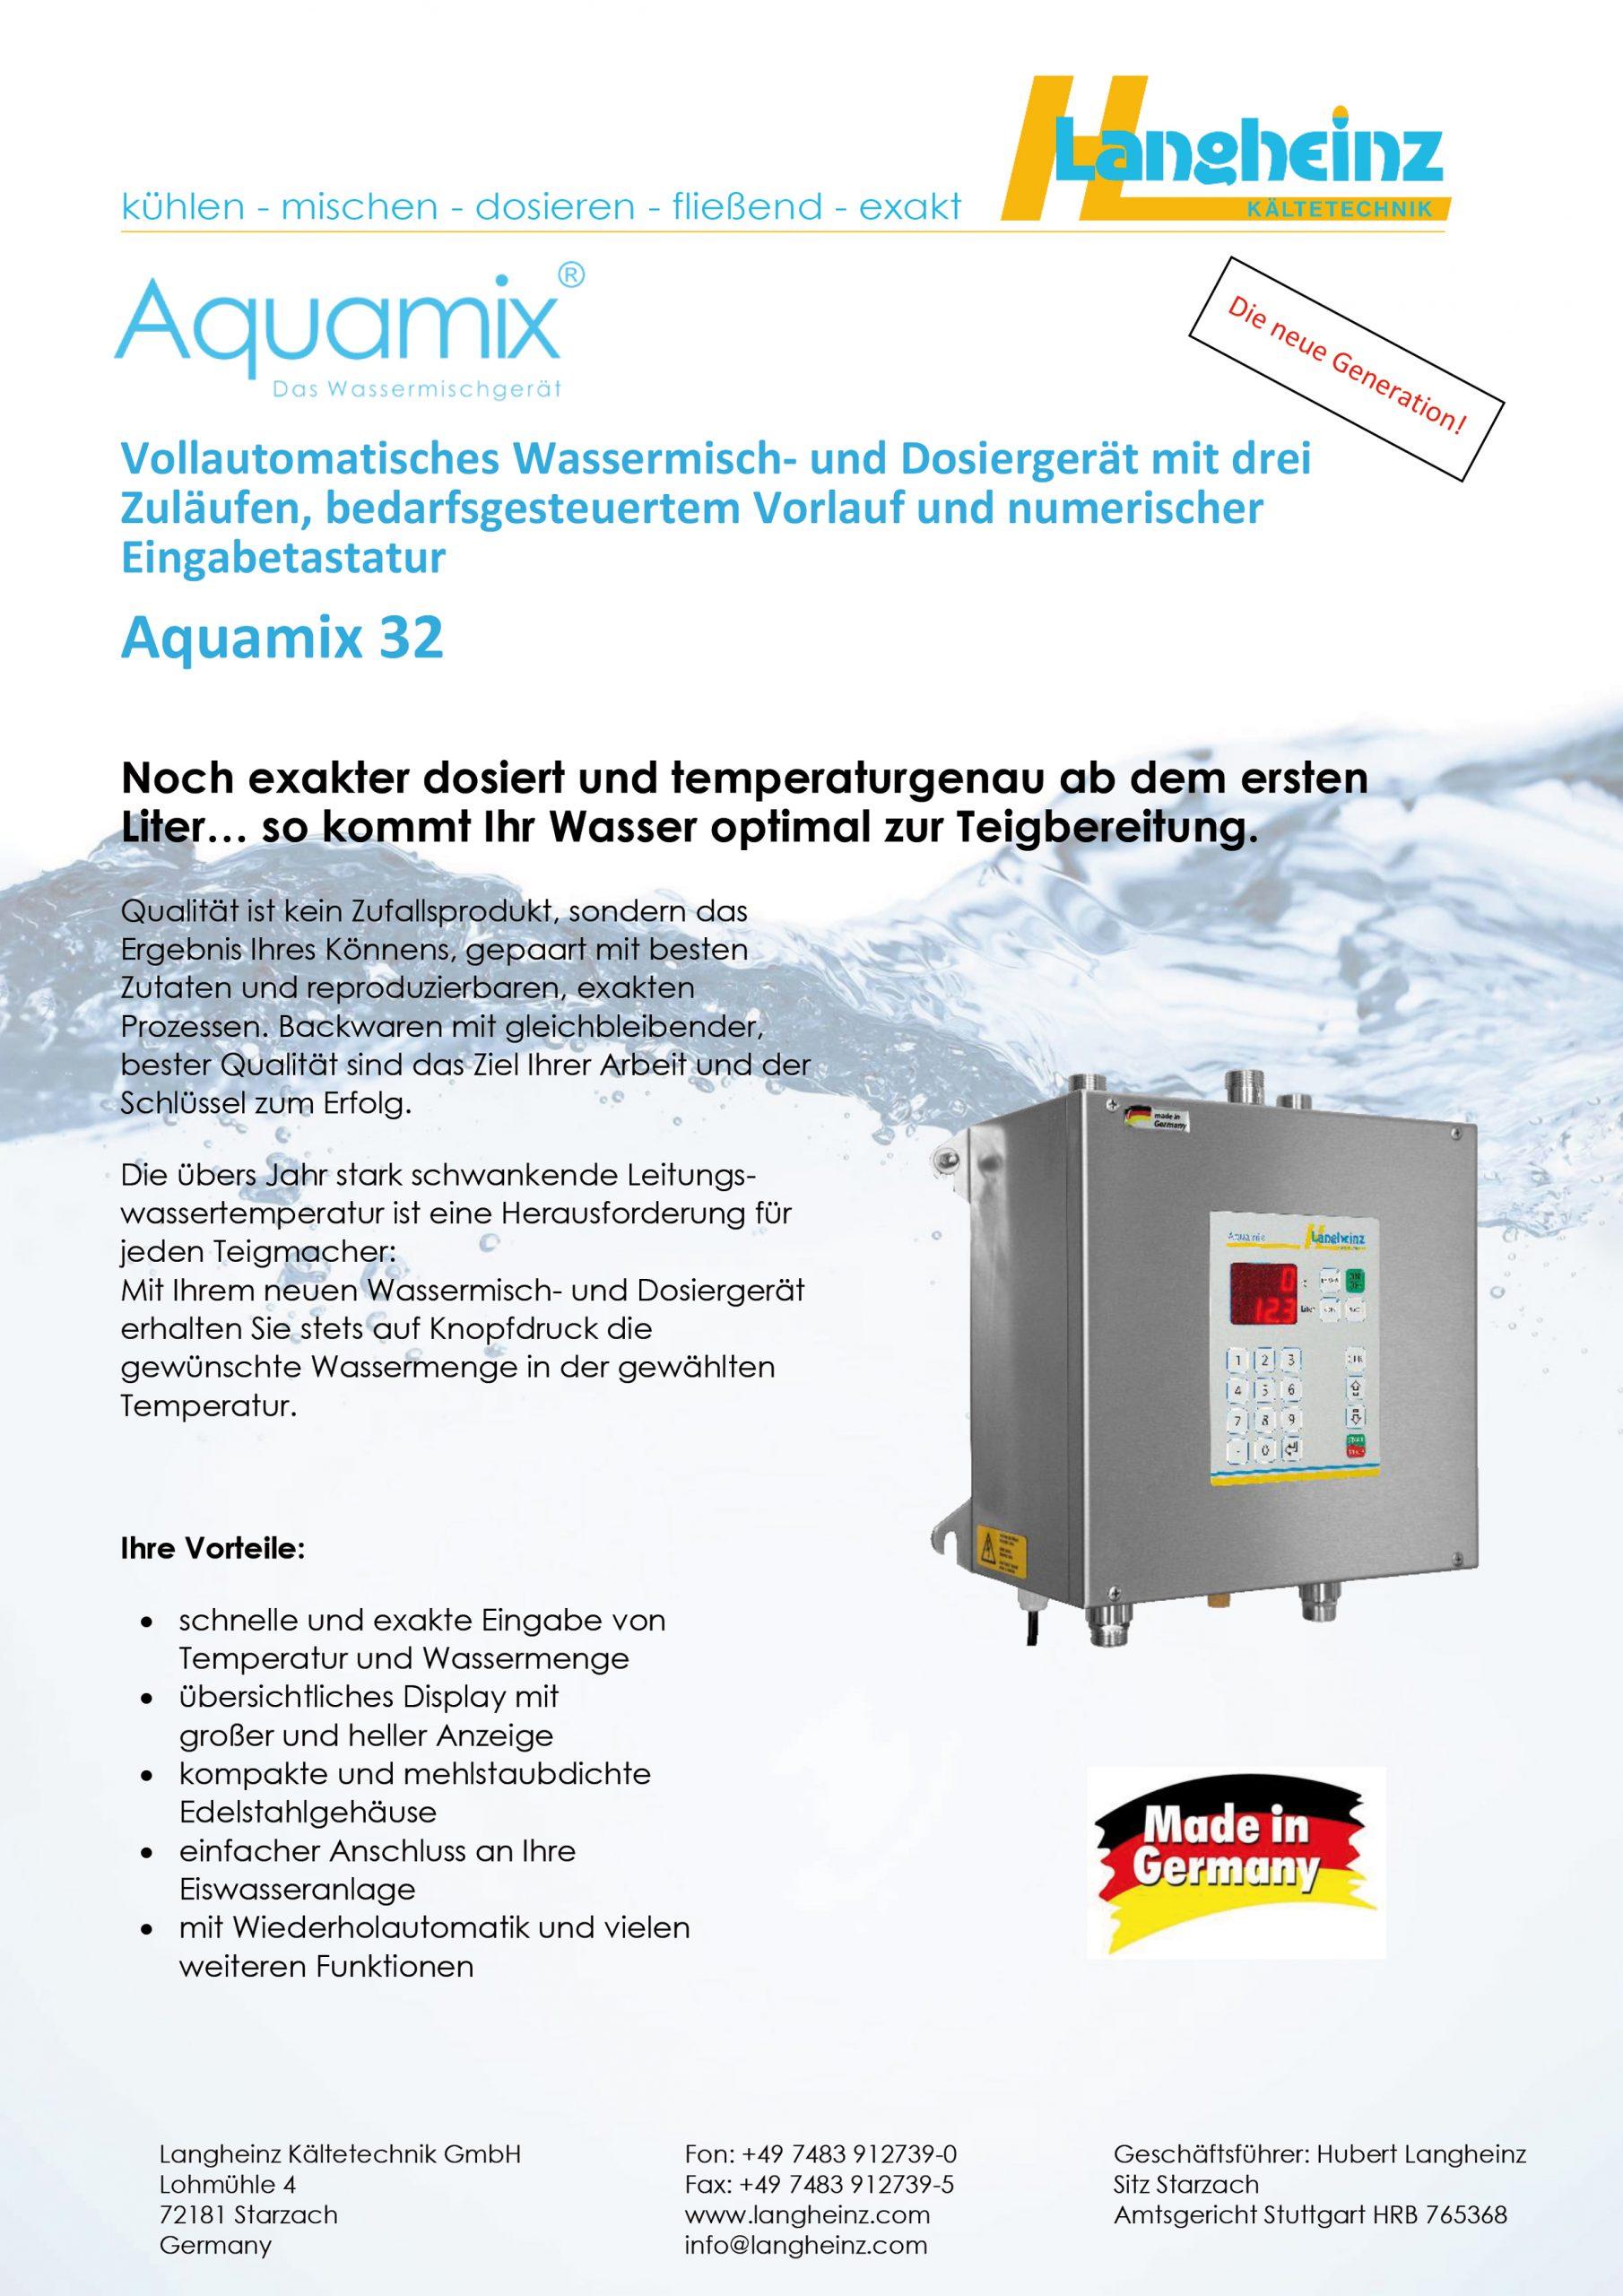 Datenblatt Aquamix 32 (Preview)